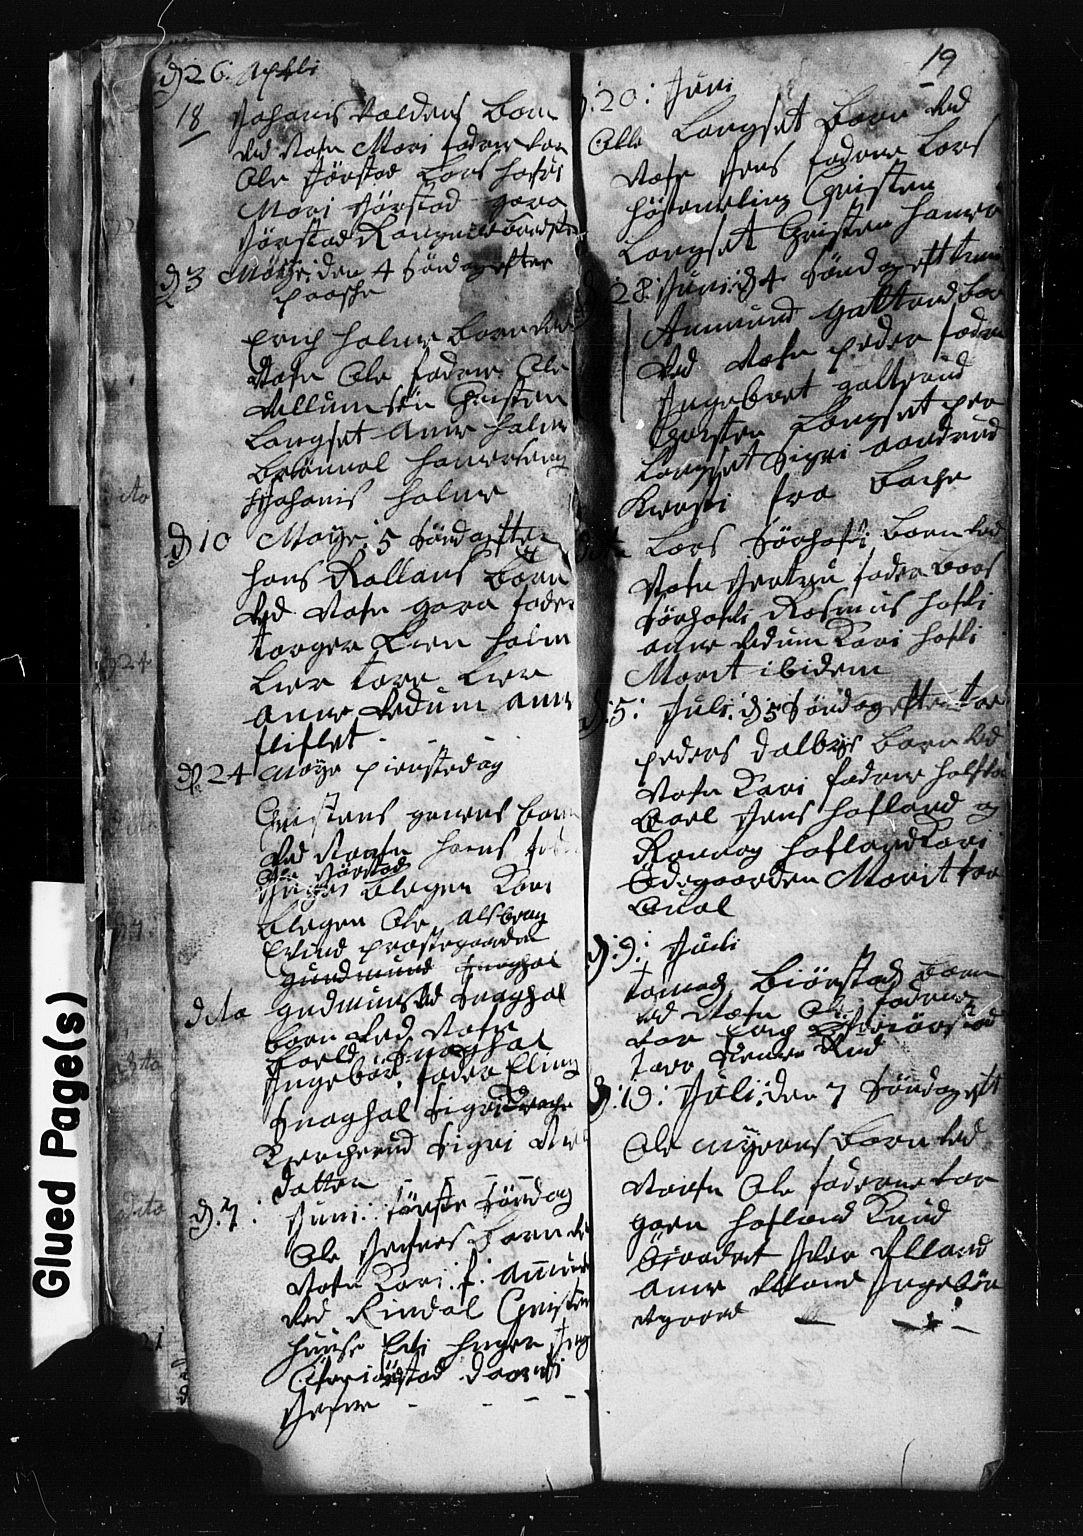 SAH, Fåberg prestekontor, Klokkerbok nr. 1, 1727-1767, s. 18-19